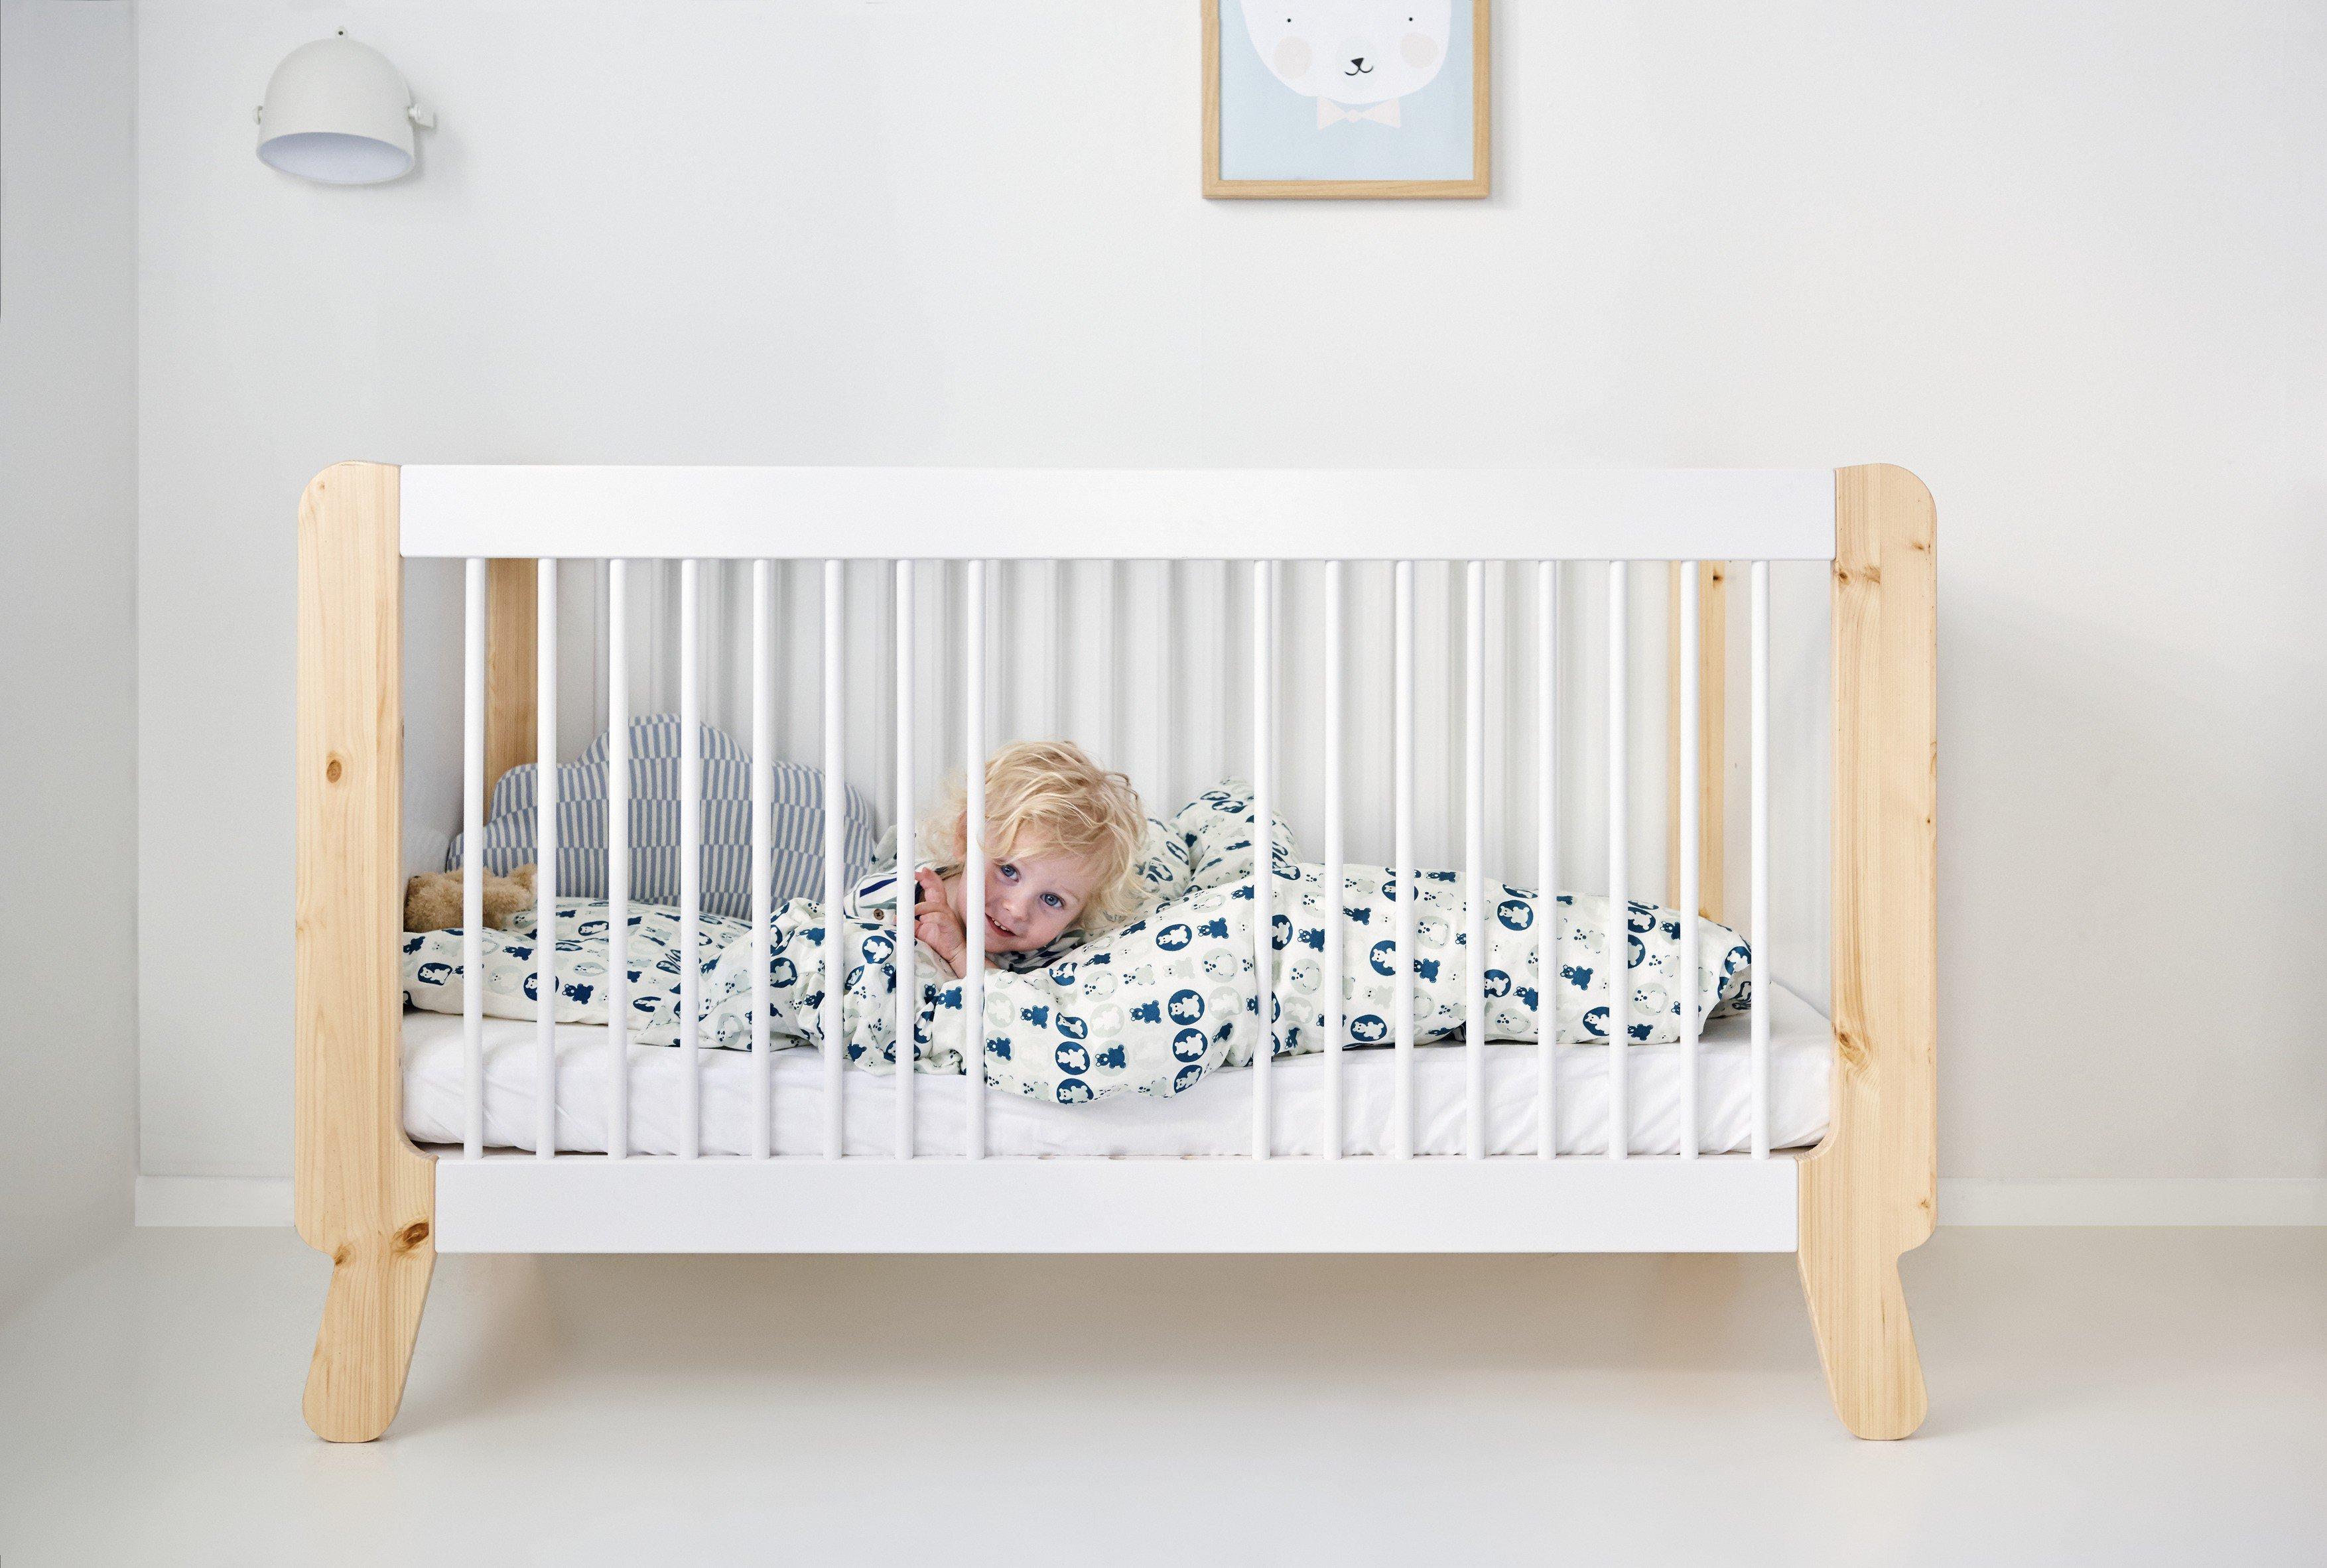 flexa n st babybett kiefer wei natur m bel letz ihr online shop. Black Bedroom Furniture Sets. Home Design Ideas